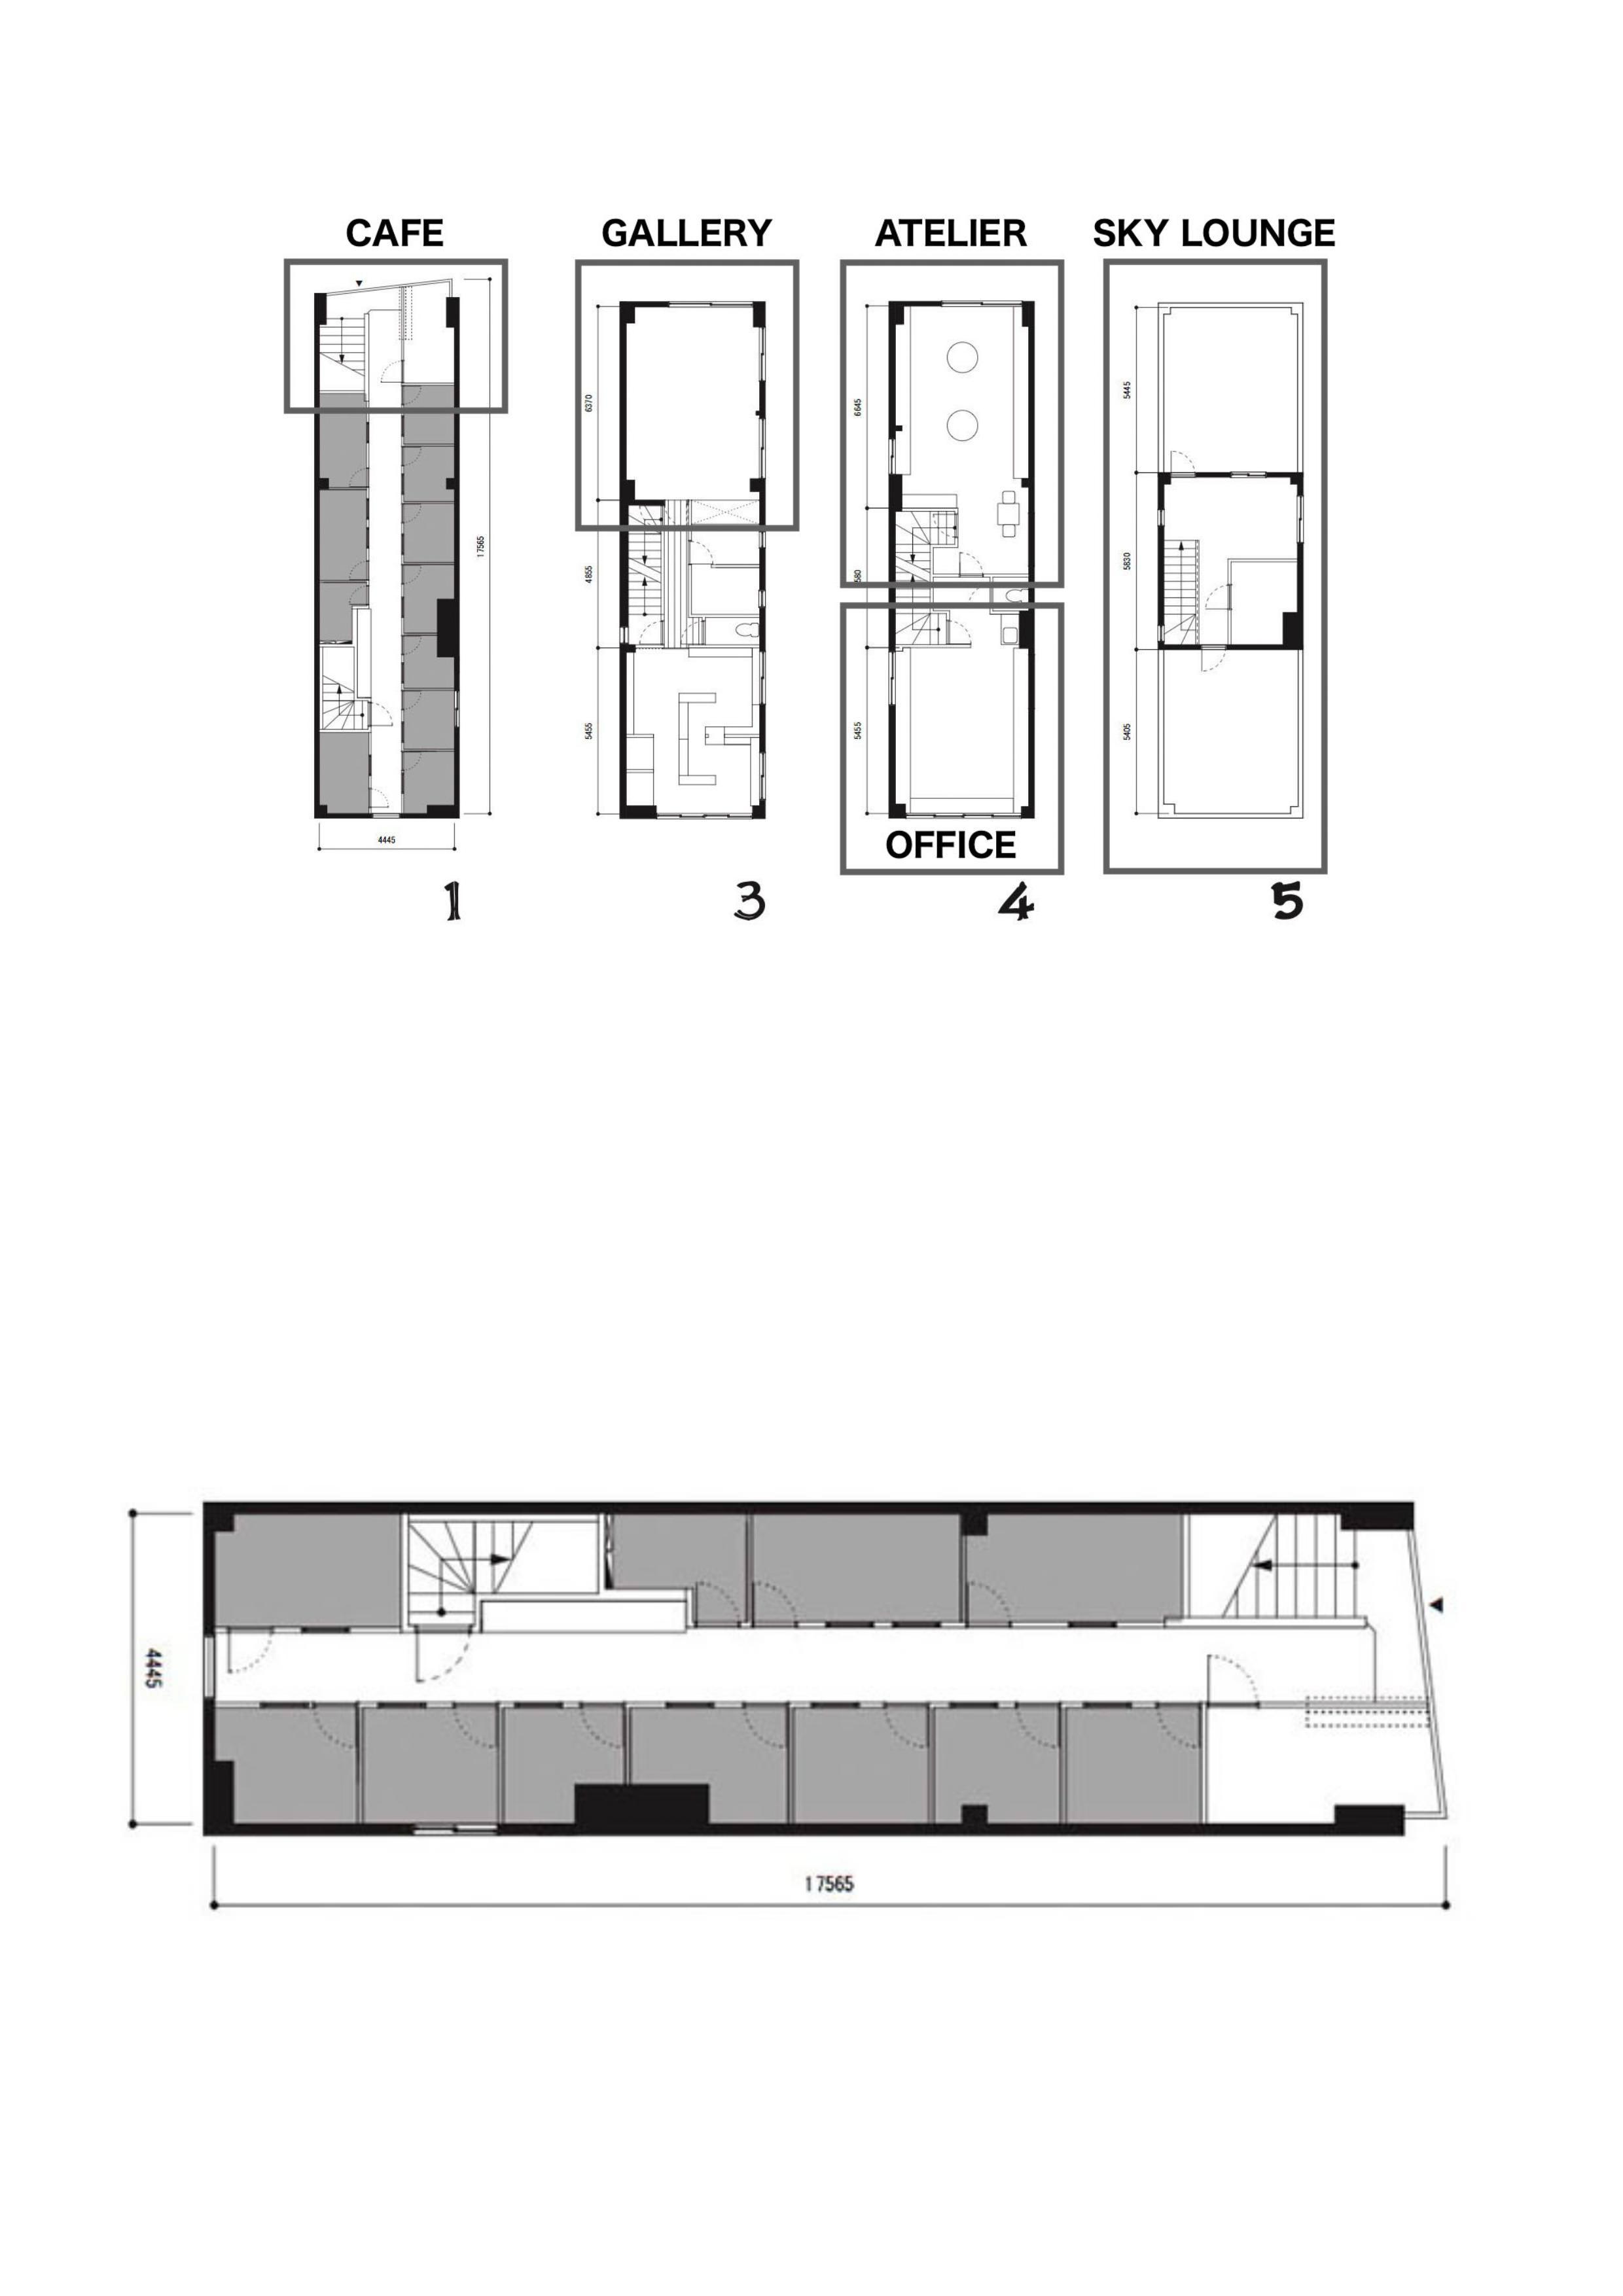 GOBLIN.下北沢BLDG店 -CAFE-平面図